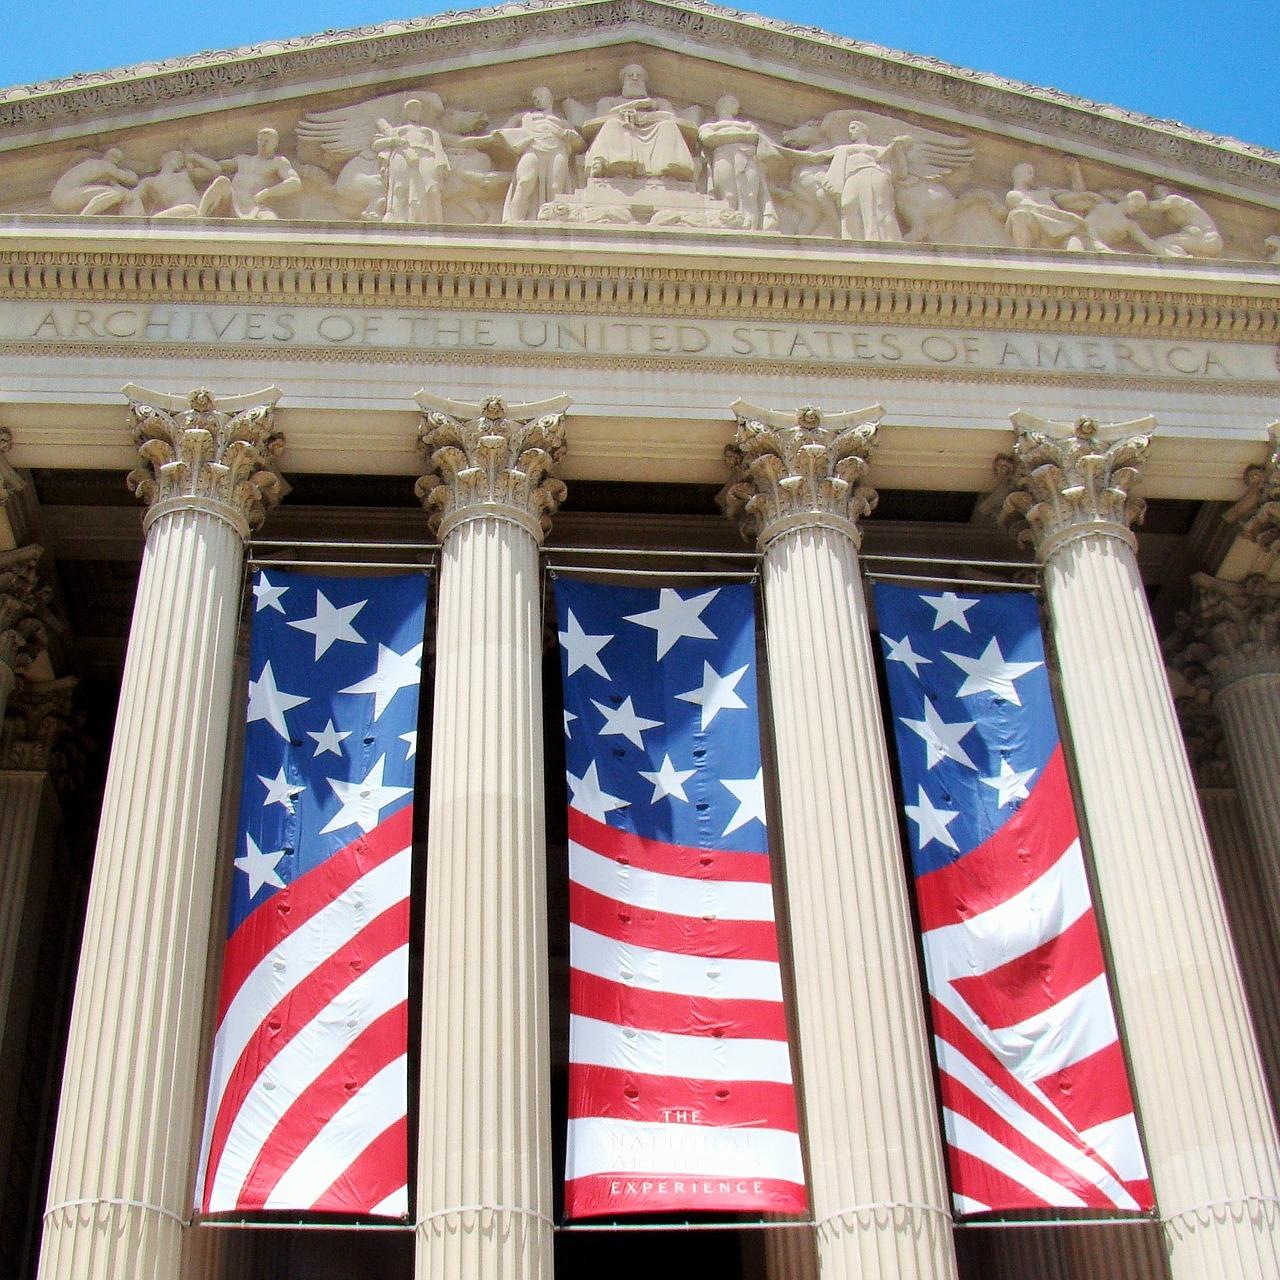 Federal judge dismisses suit seeking recognition of Virginia's vote to ratify ERA